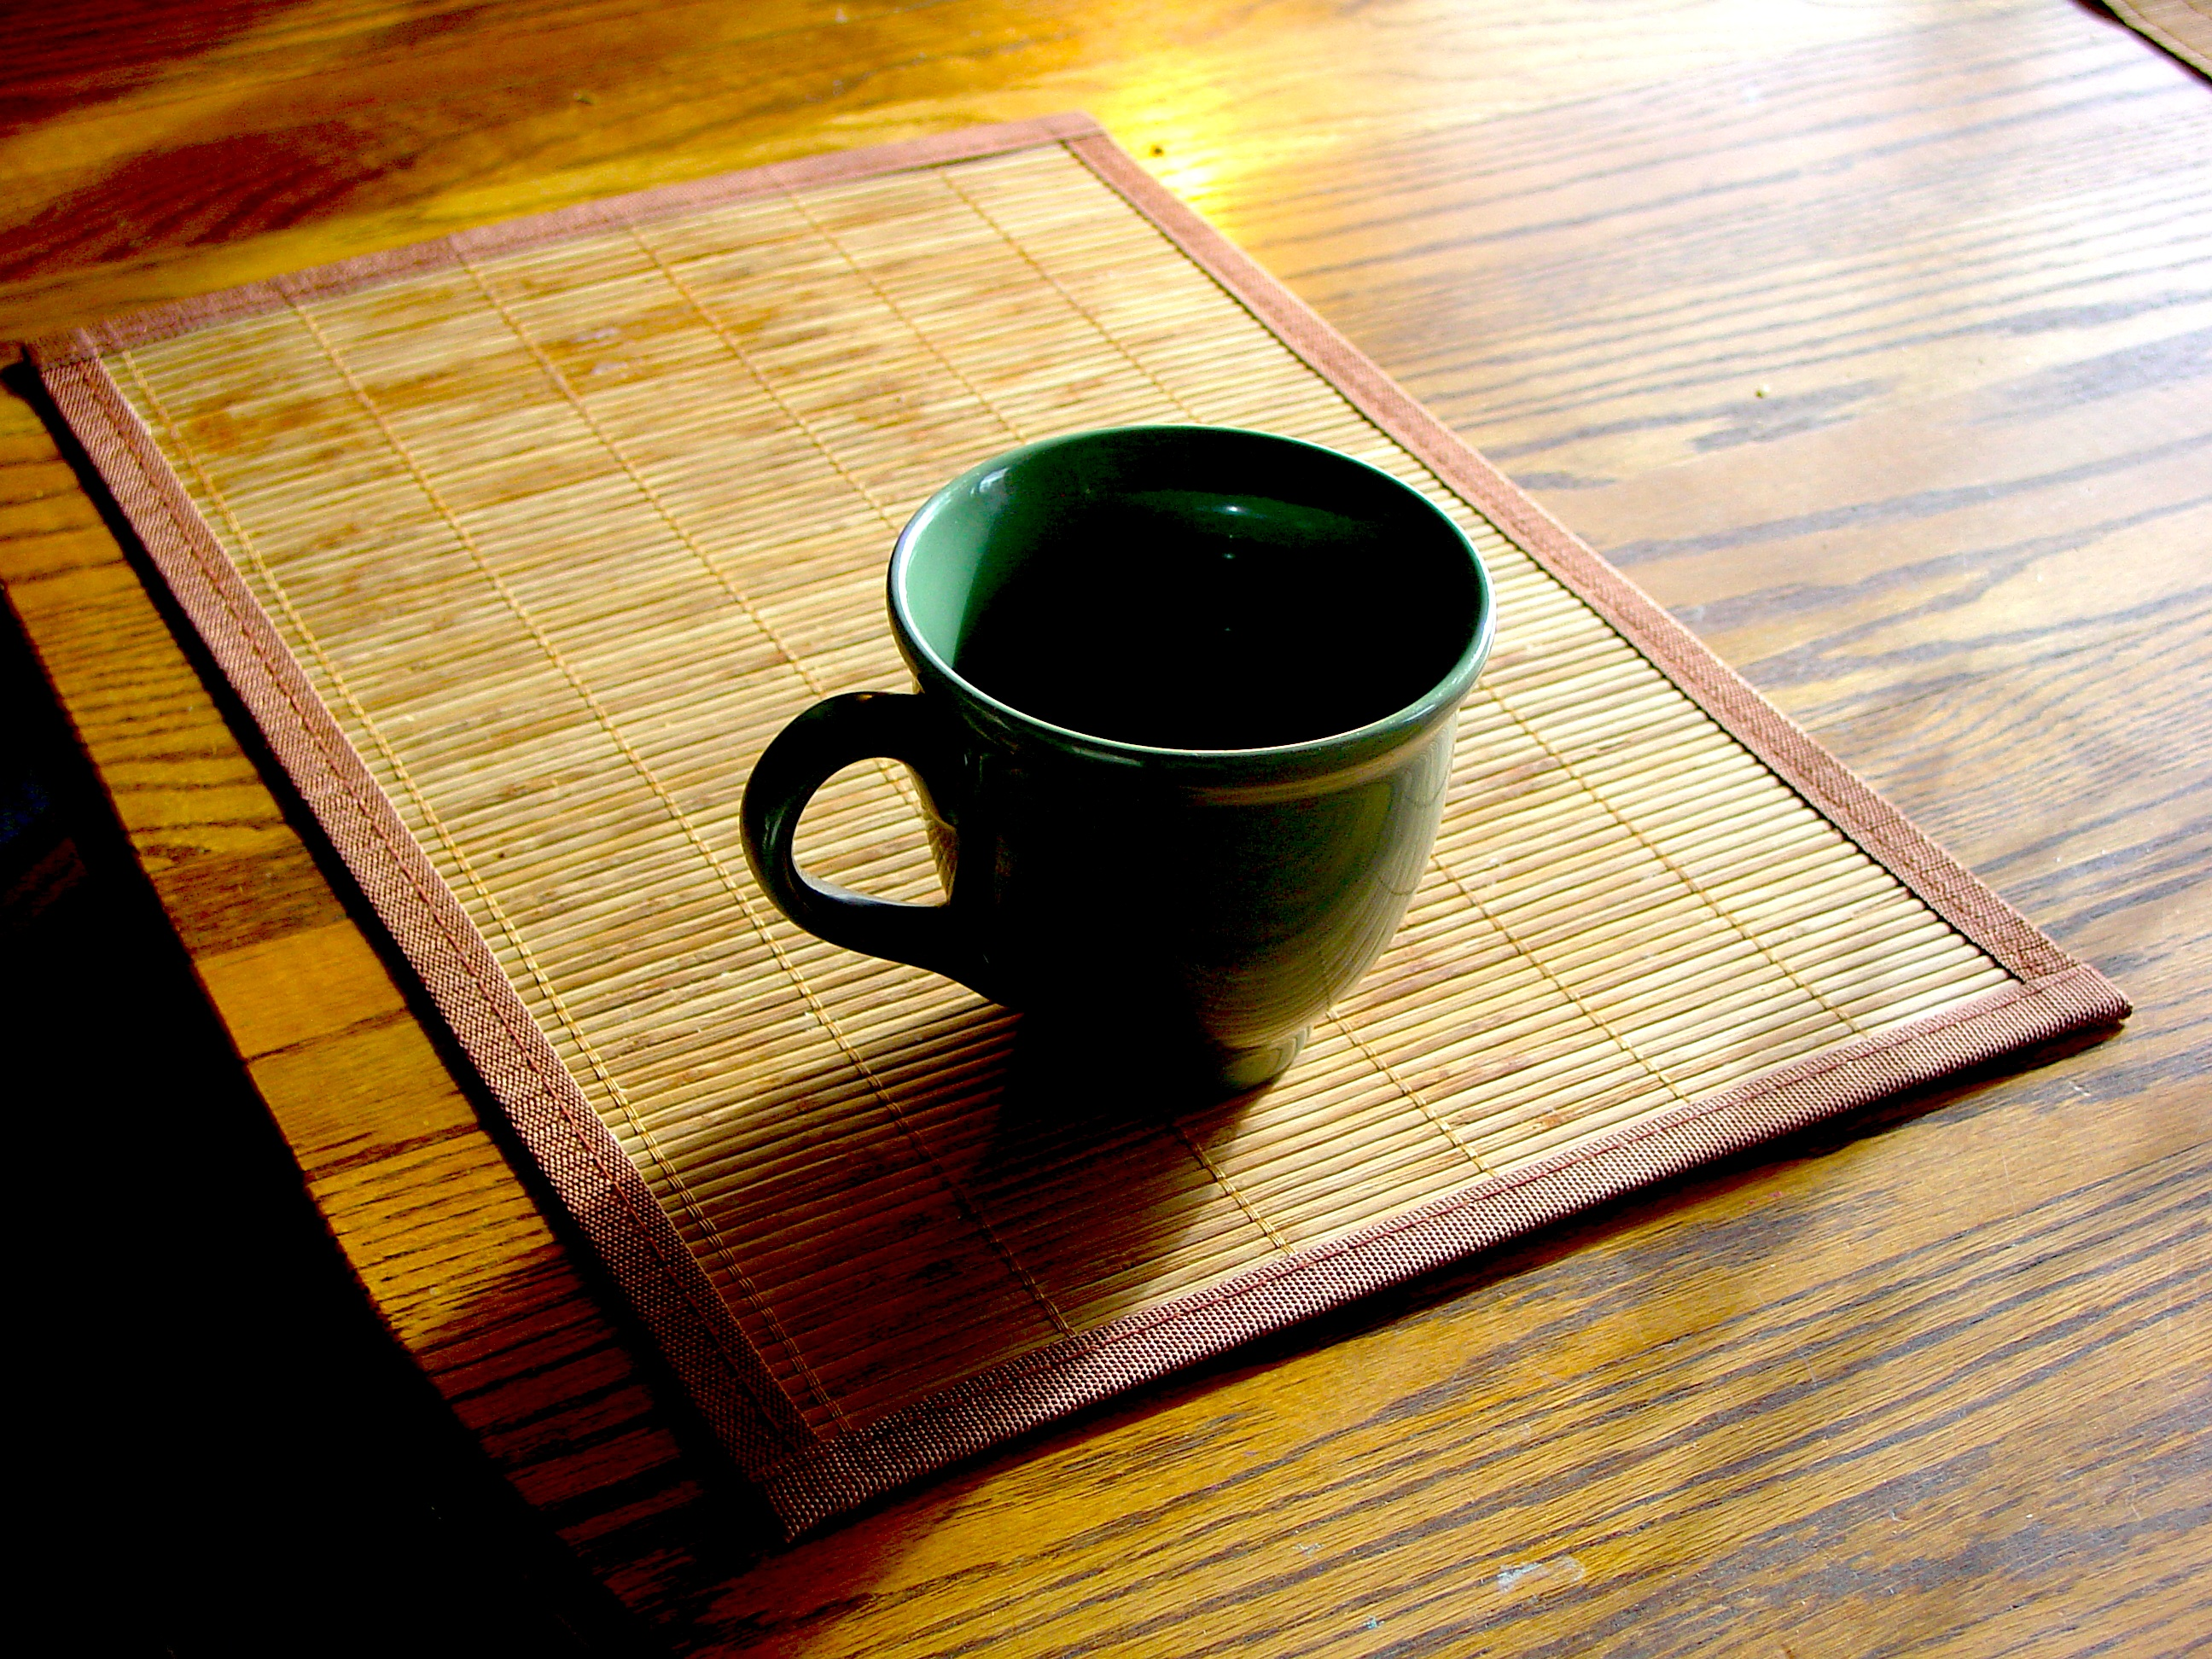 taza de café puesta sobre una mesa de madera